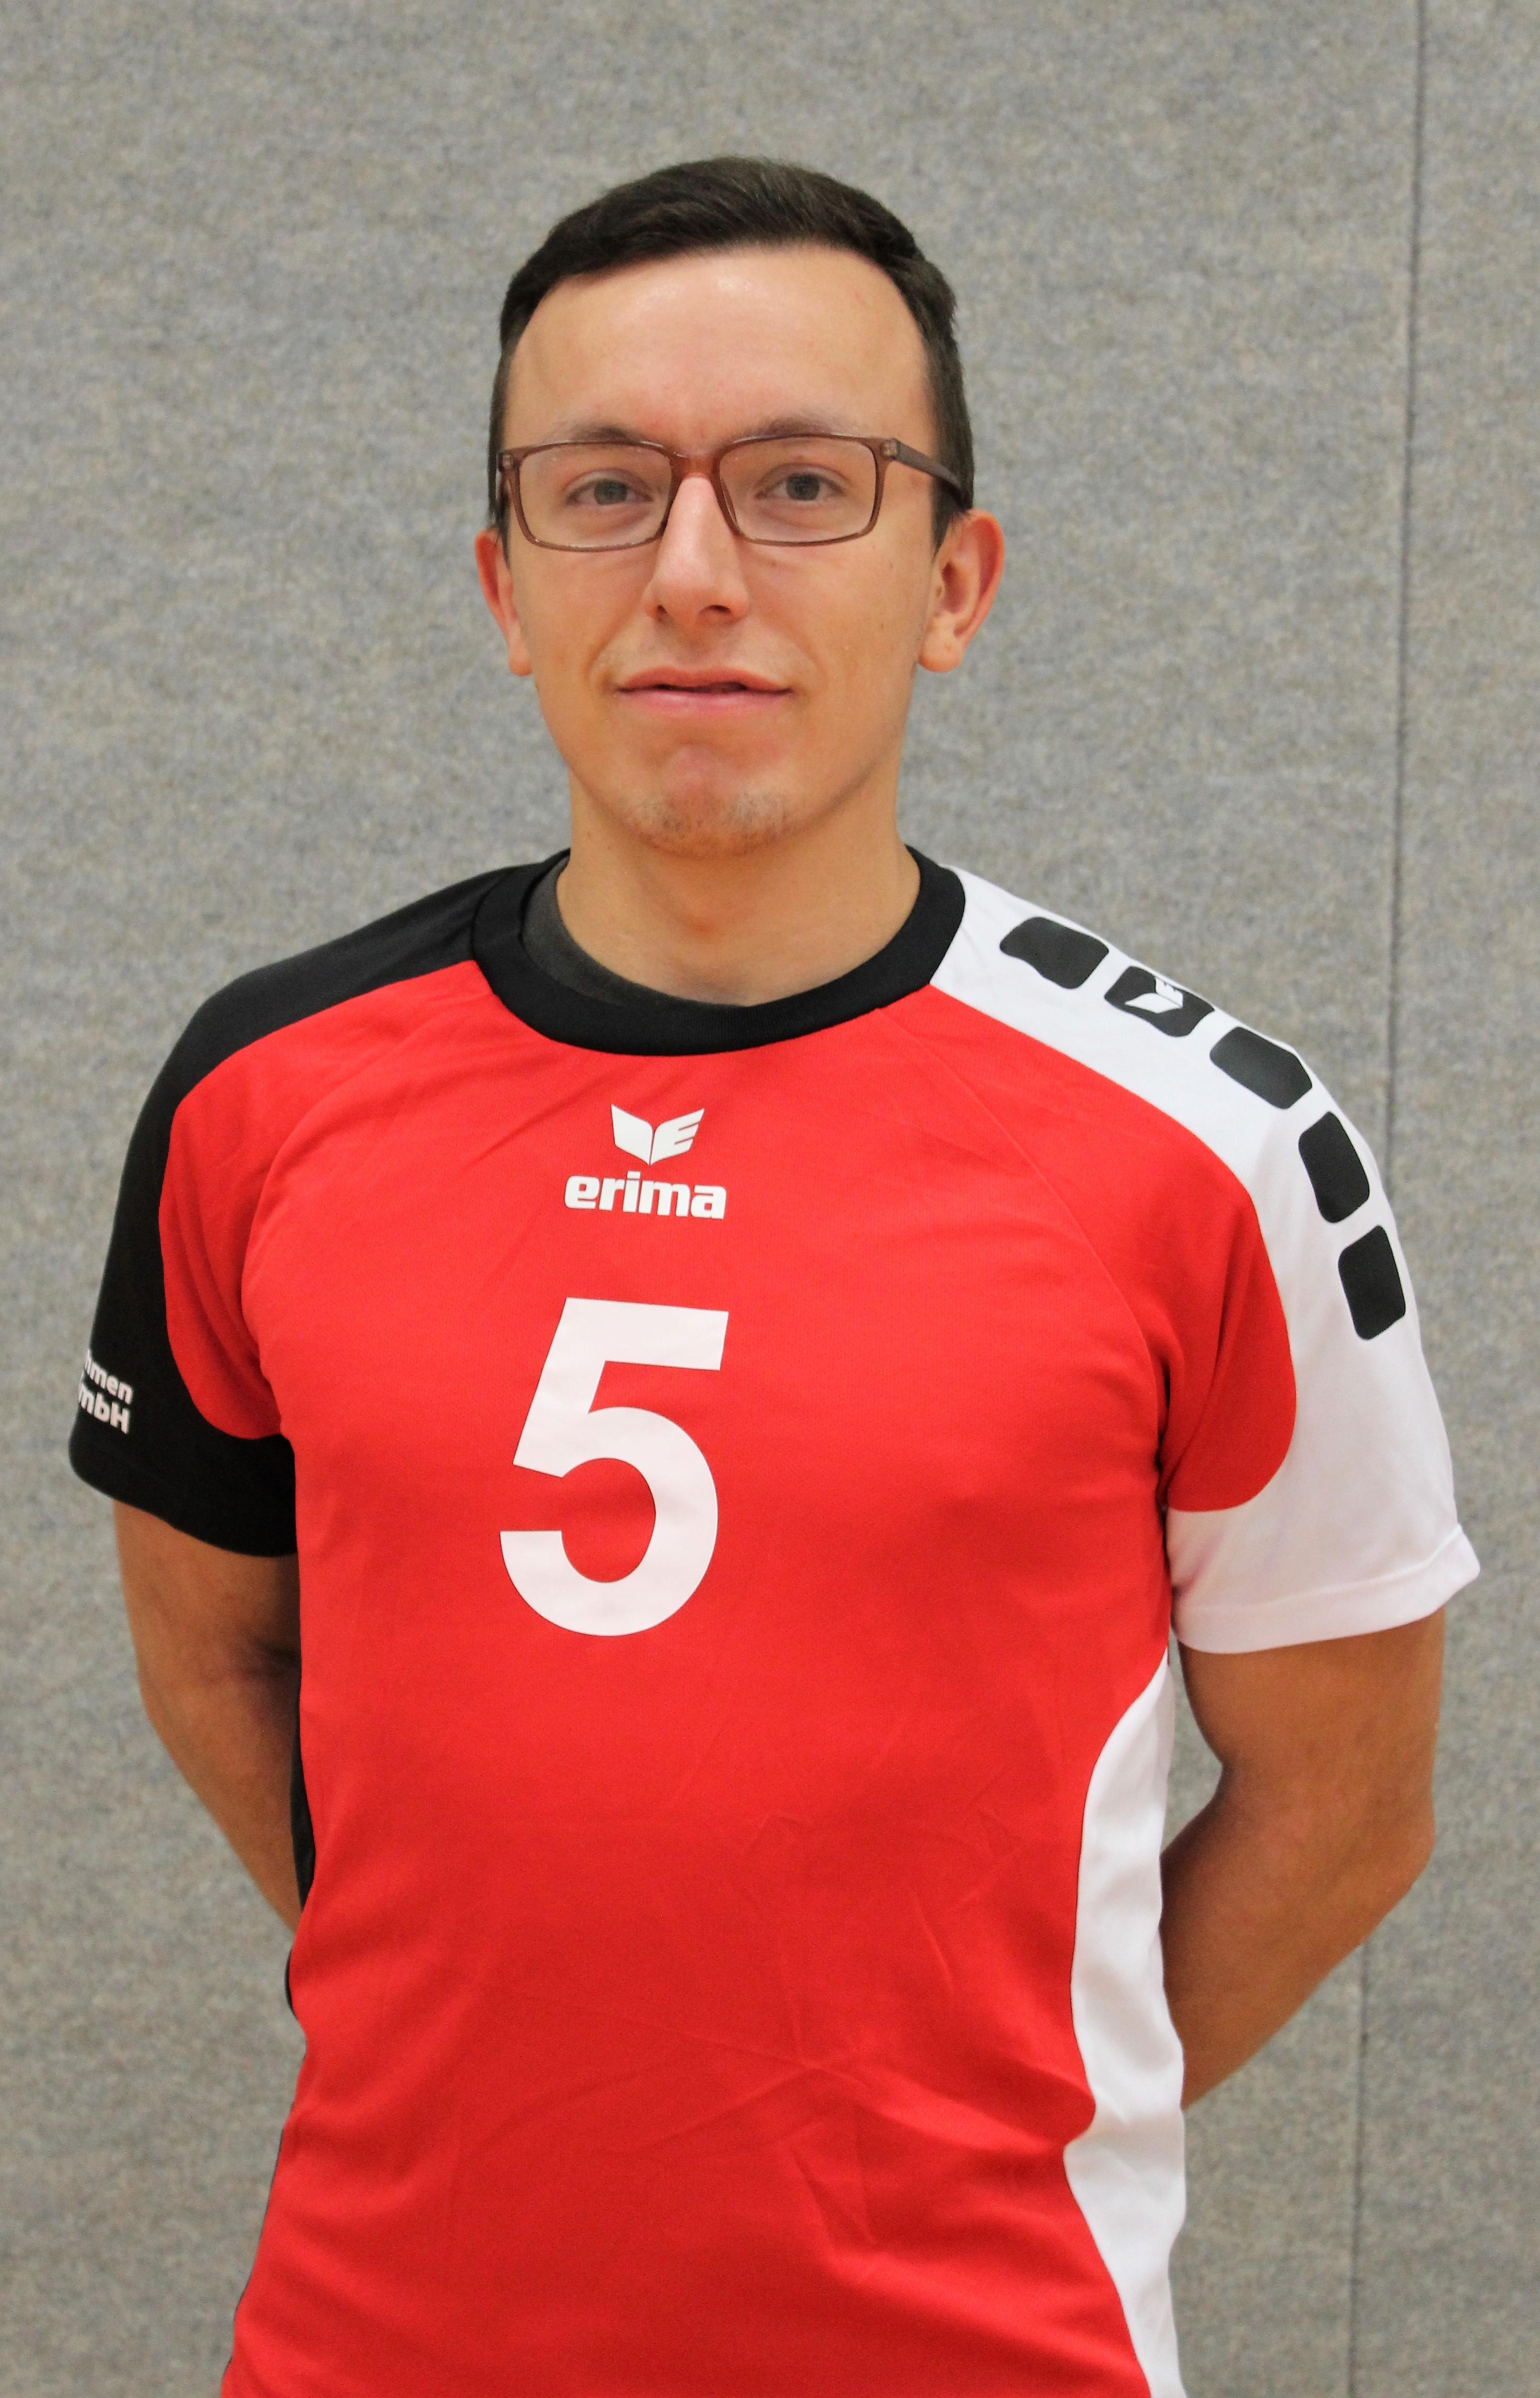 Ricardo Frischke  Trikotnummer: 5  Position: Libero  Größe: 1,72 m